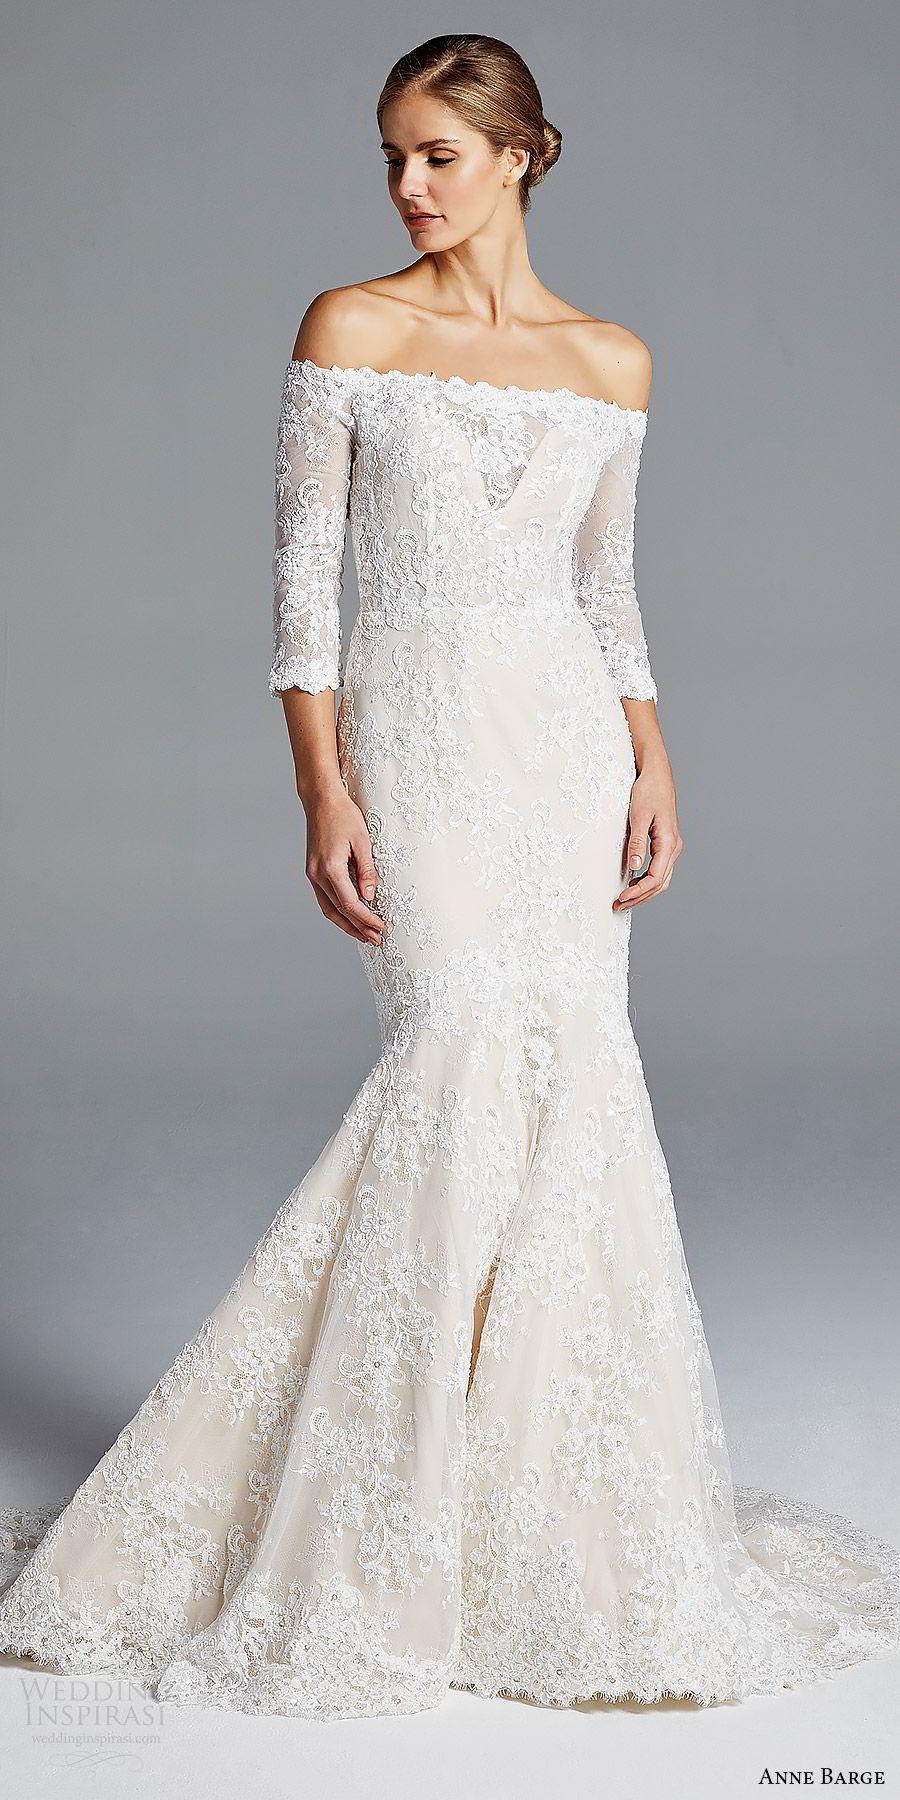 anne barge bridal spring 2019 3 quarter sleeves off shoulder illusion sweetheart lace mermaid wedding dress (loren) mv elegant romantic